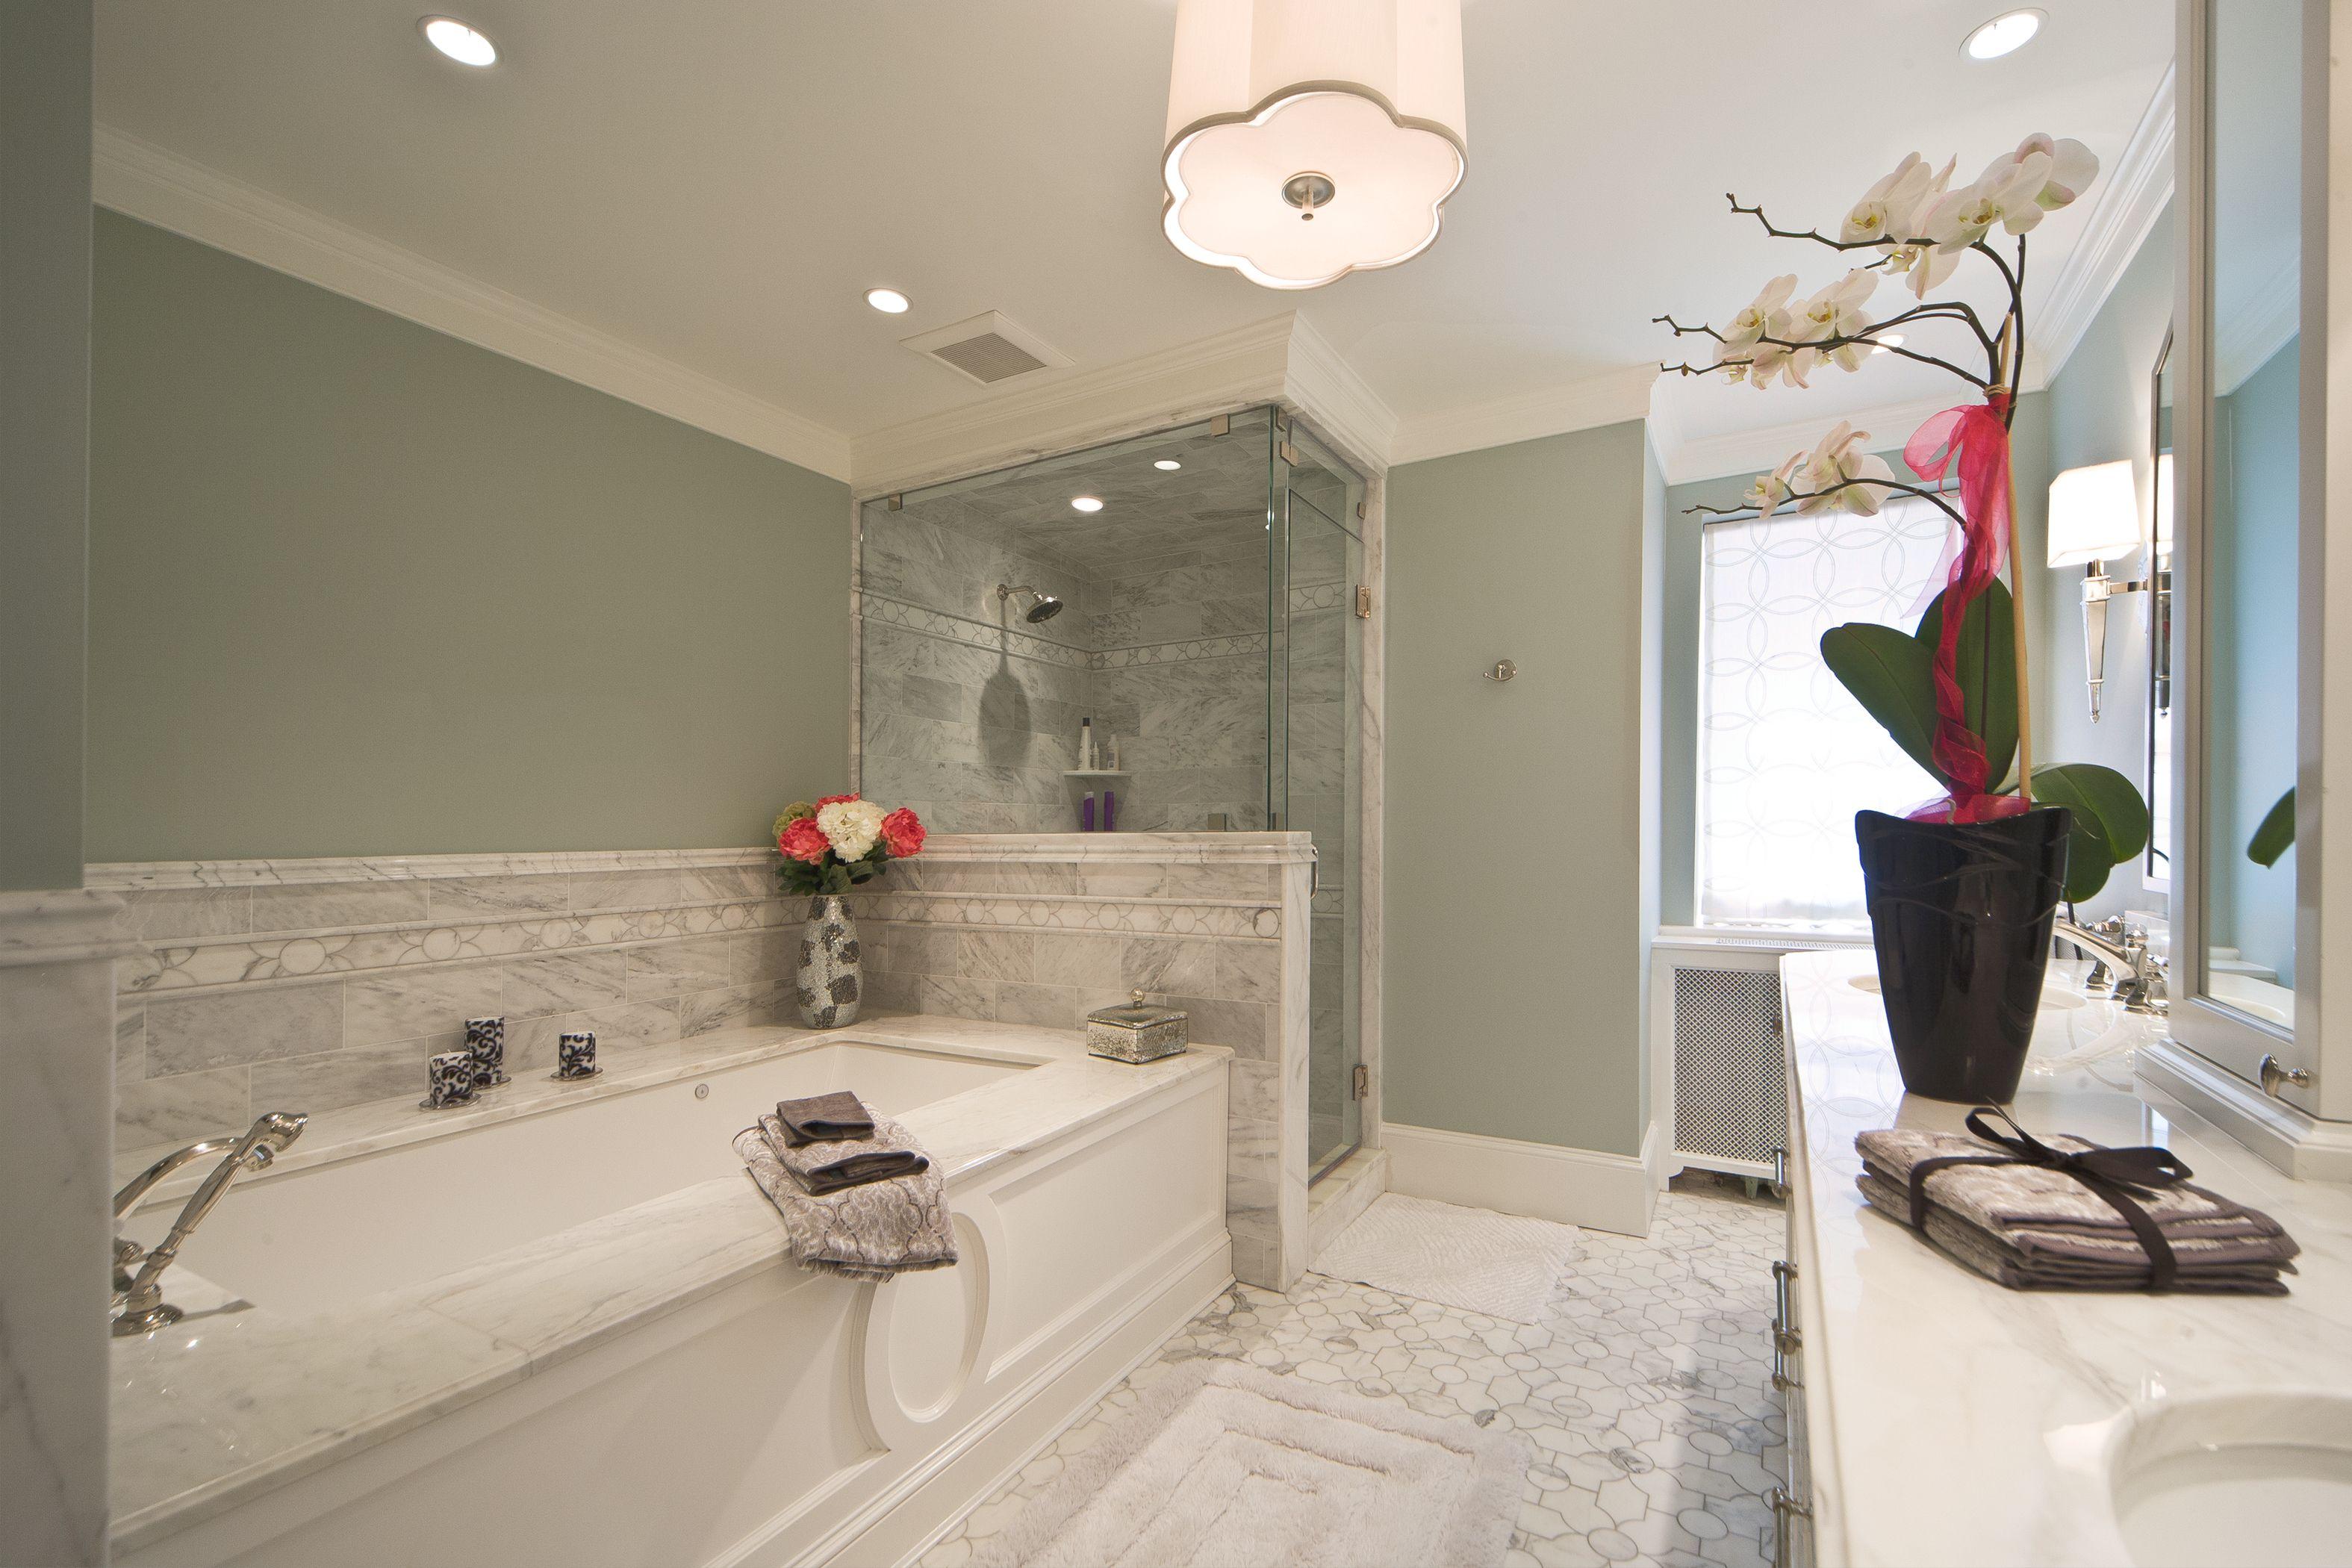 Master Bathroom Renovation With Custom Marble Floor And Steam